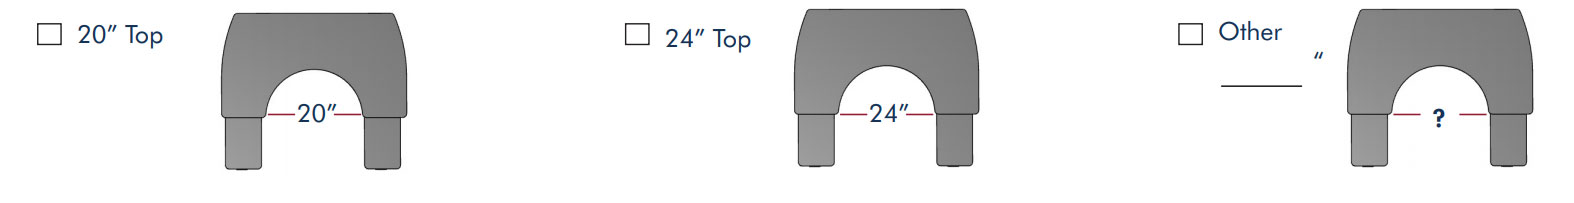 standard-size